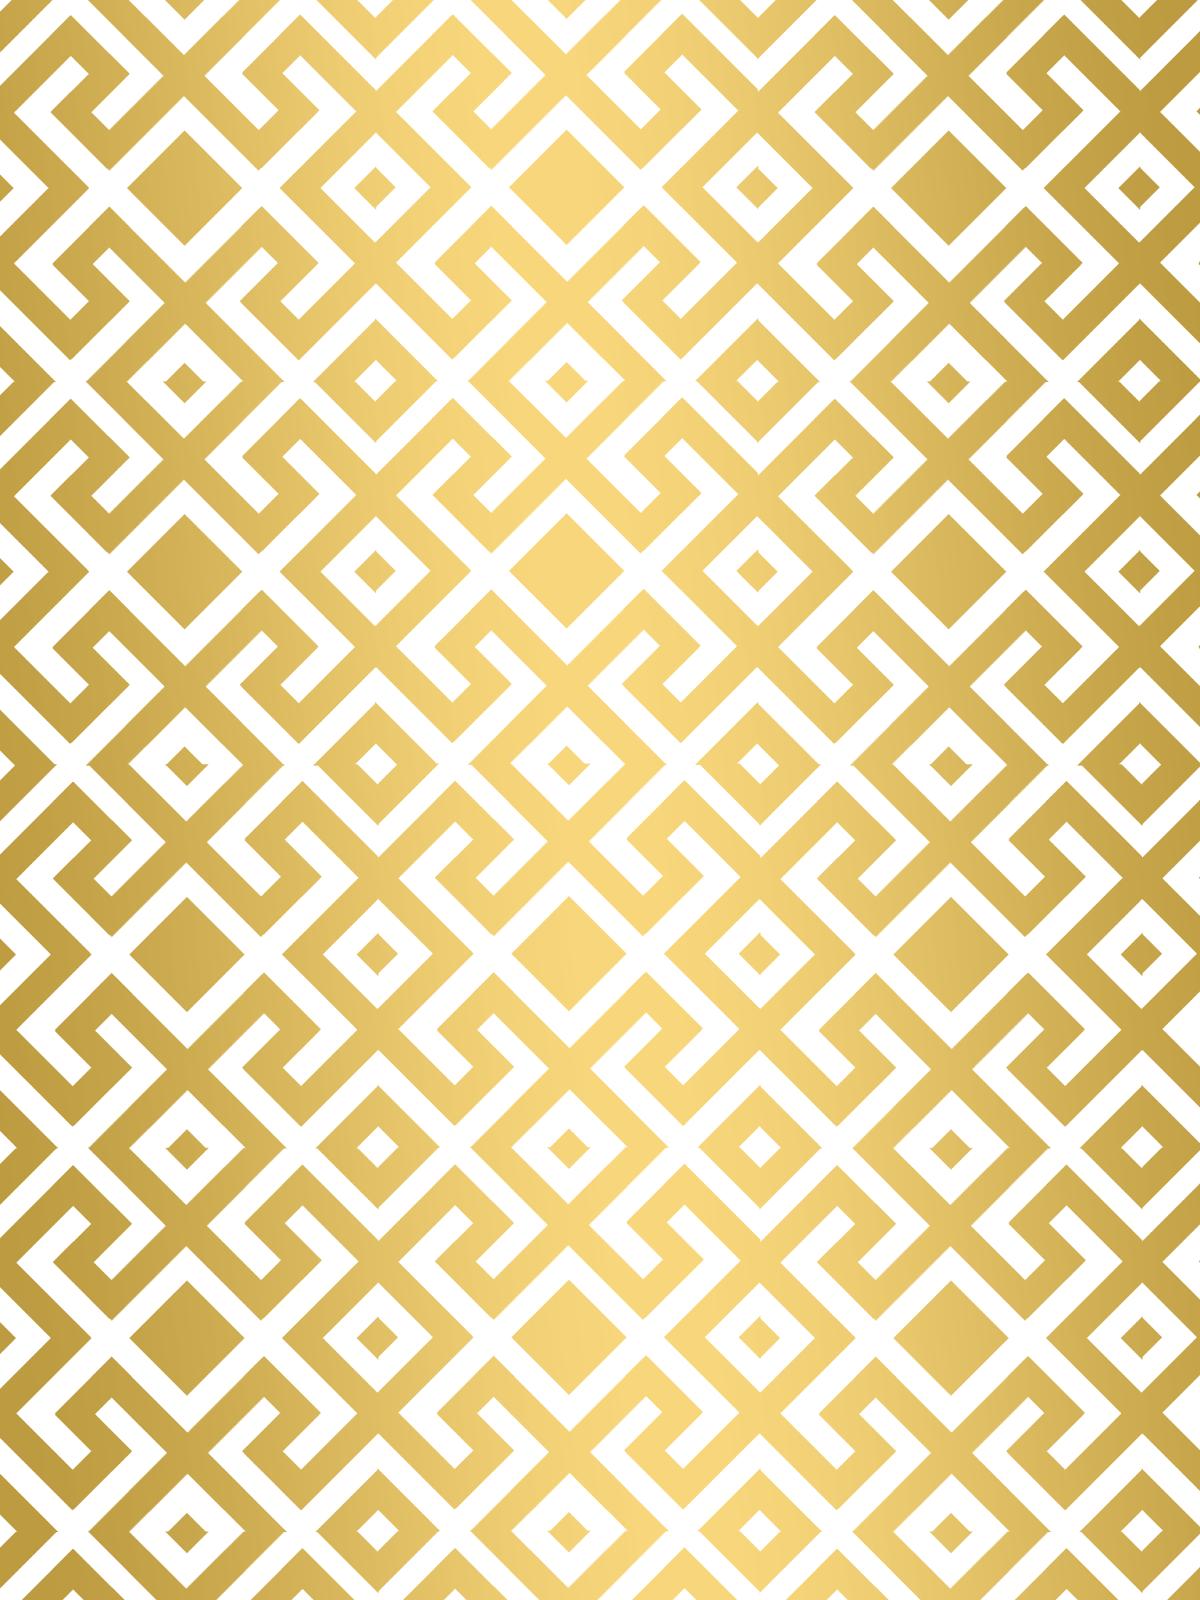 Cute Chevron Wallpapers For Ipad Iphone Ipad Wallpaper Geometric V 1 Miss Audrey Sue